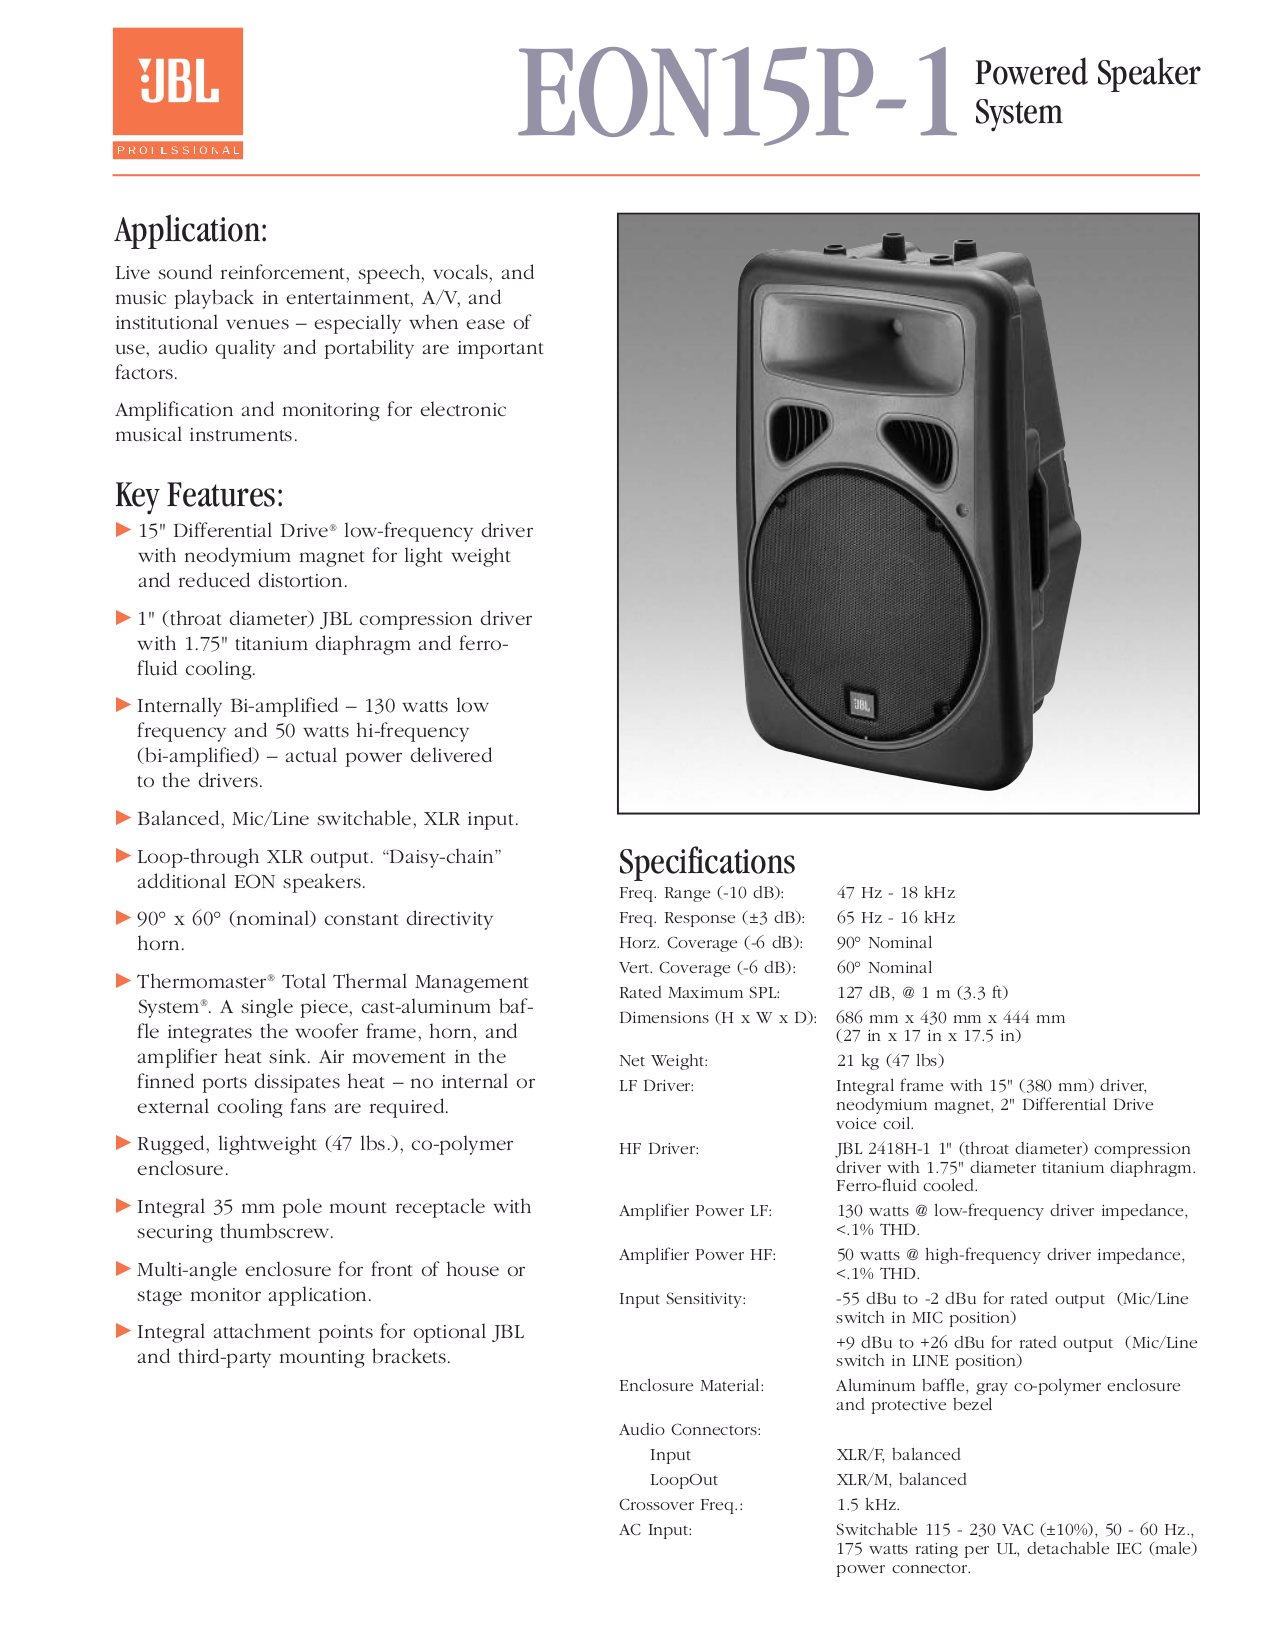 jbl eon 15 manual professional user manual ebooks u2022 rh gogradresumes com